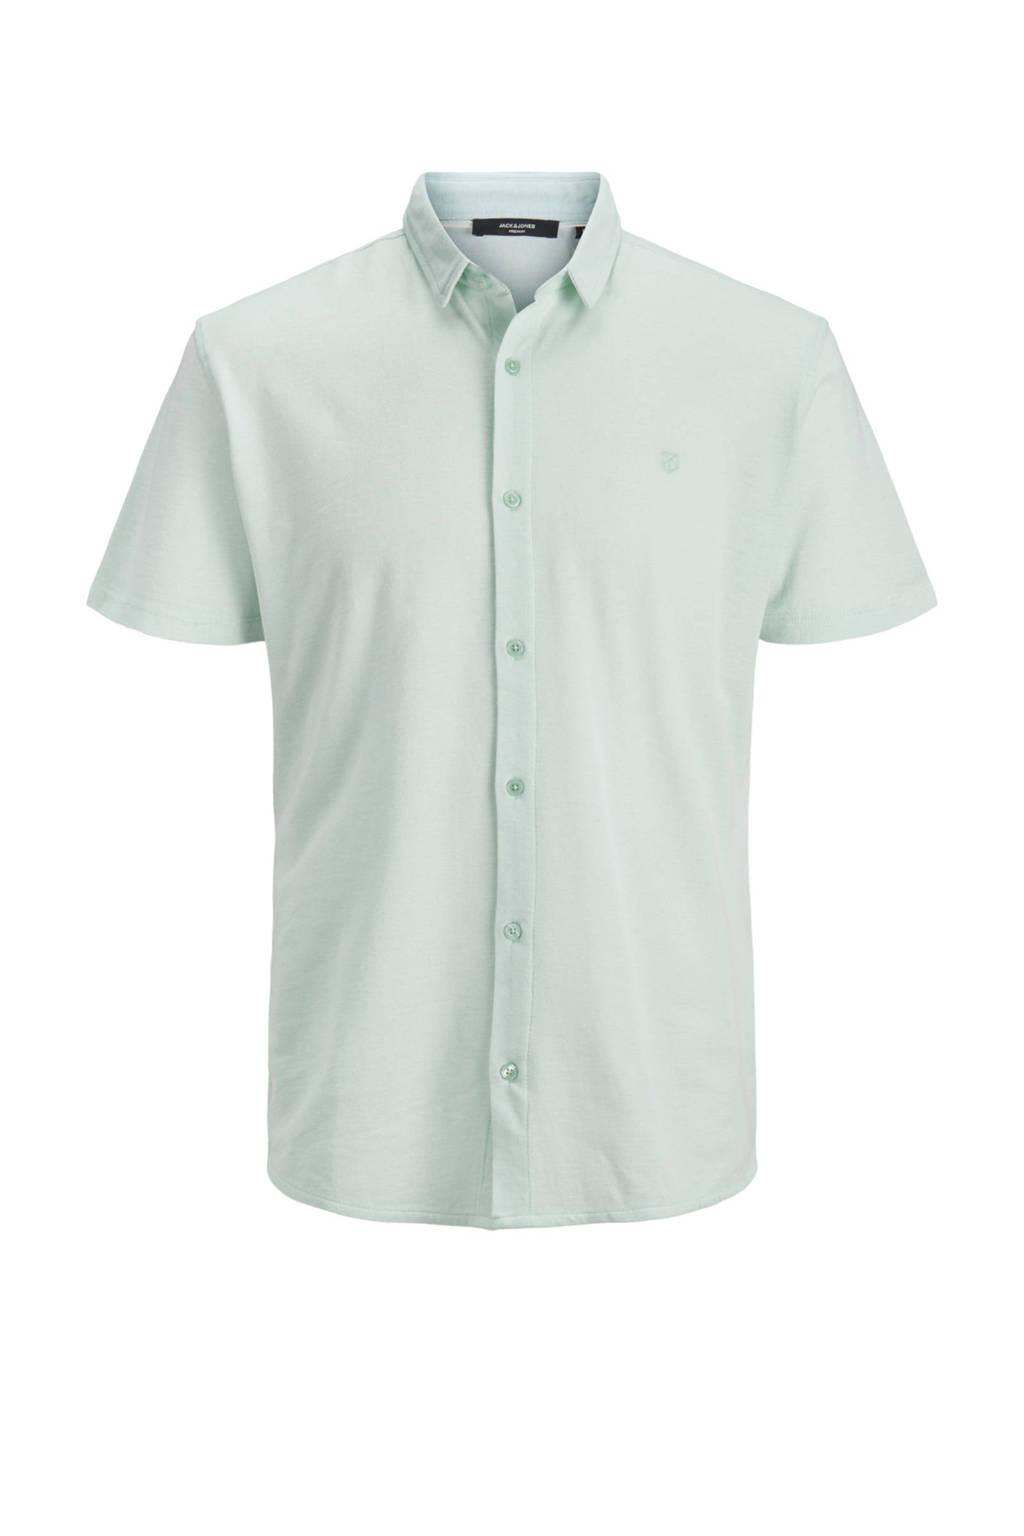 JACK & JONES PREMIUM gemêleerd slim fit overhemd lichtgroen, Lichtgroen